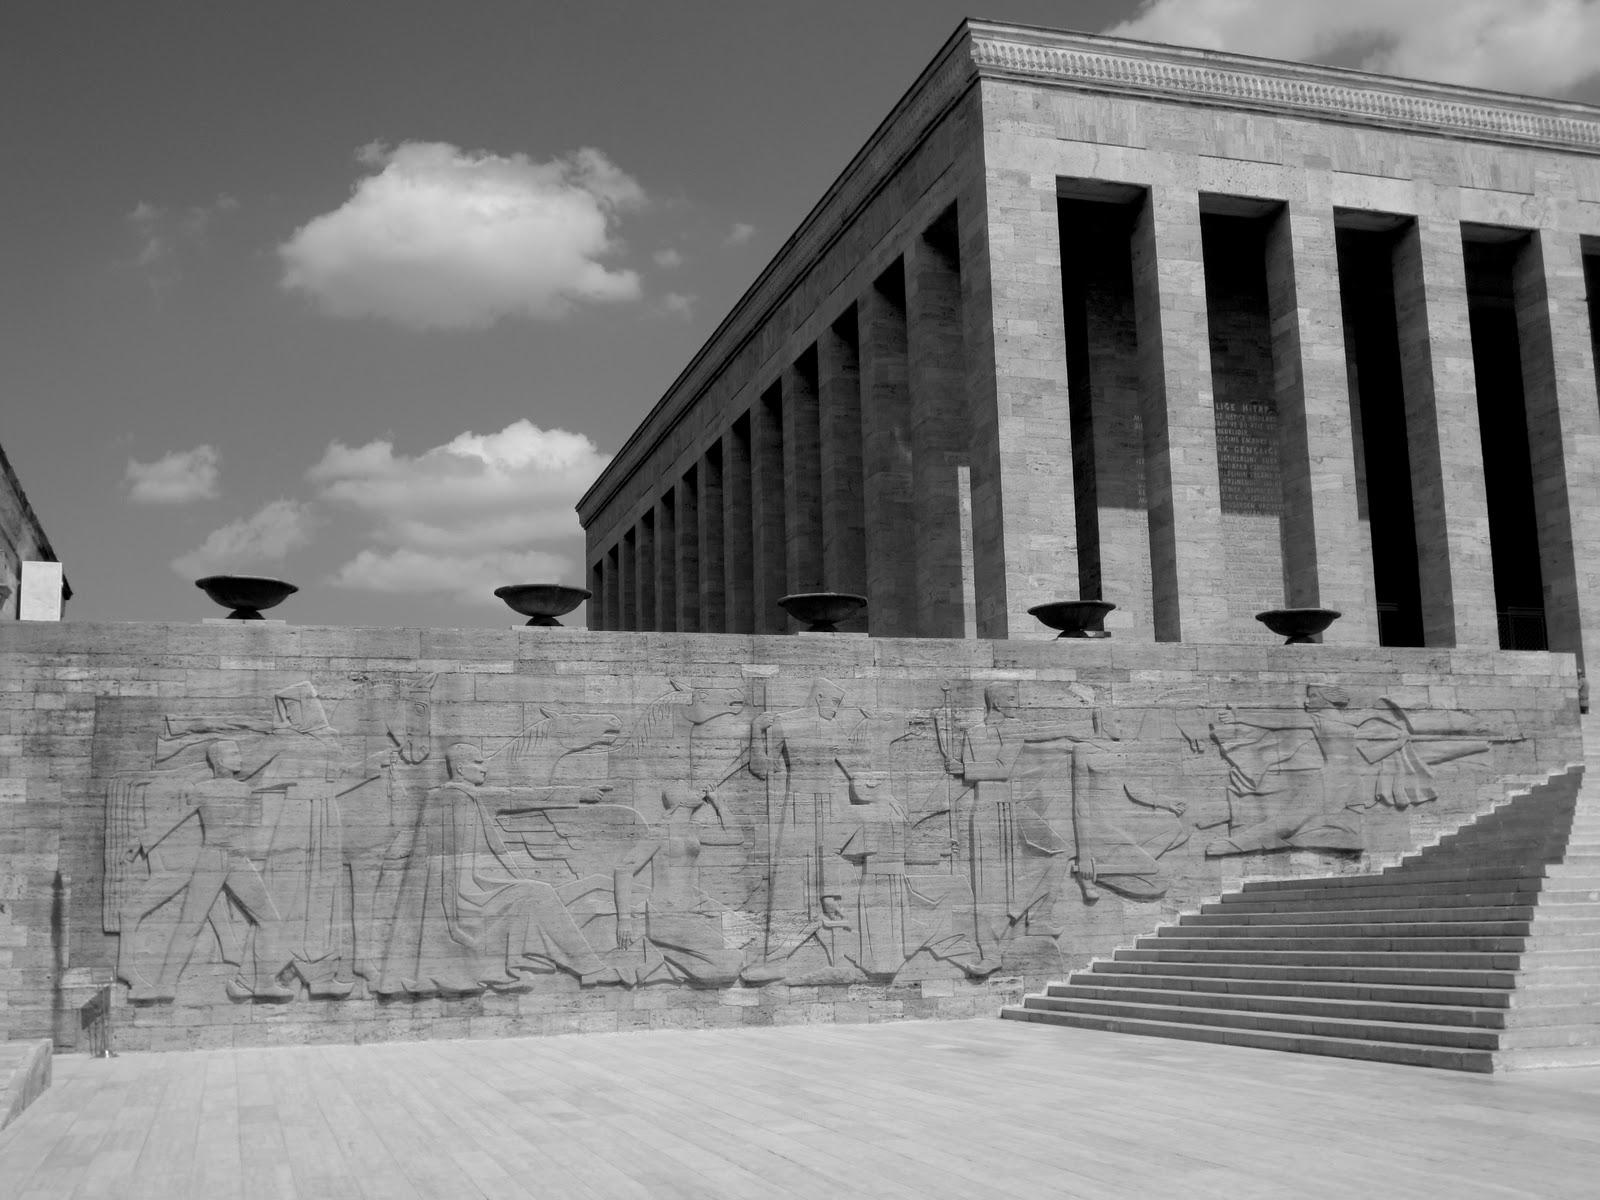 Nationalism in the Built Environment: Imagining the Turkish Nation at the Mausoleum of Mustafa Kemal Atatürk